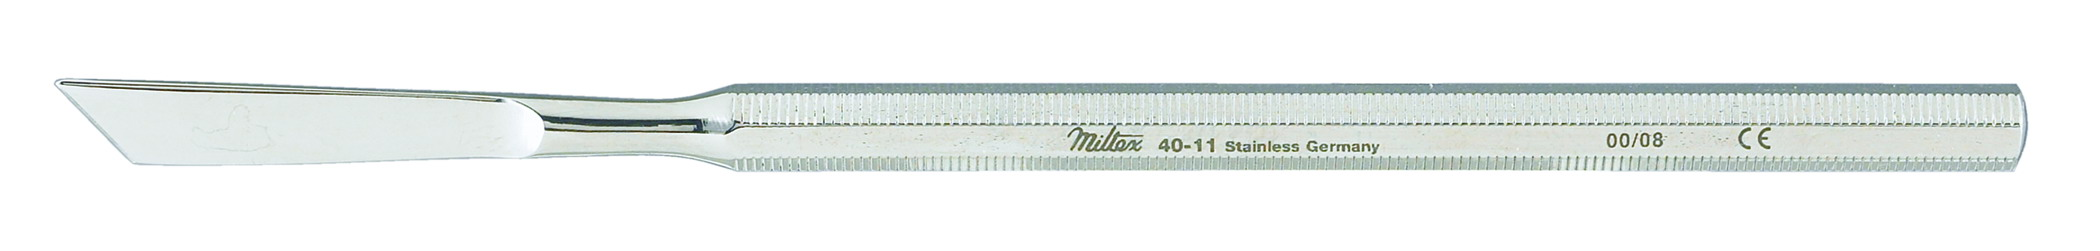 miltex-chisel-straight-8-mm-edge-40-11-miltex.jpg